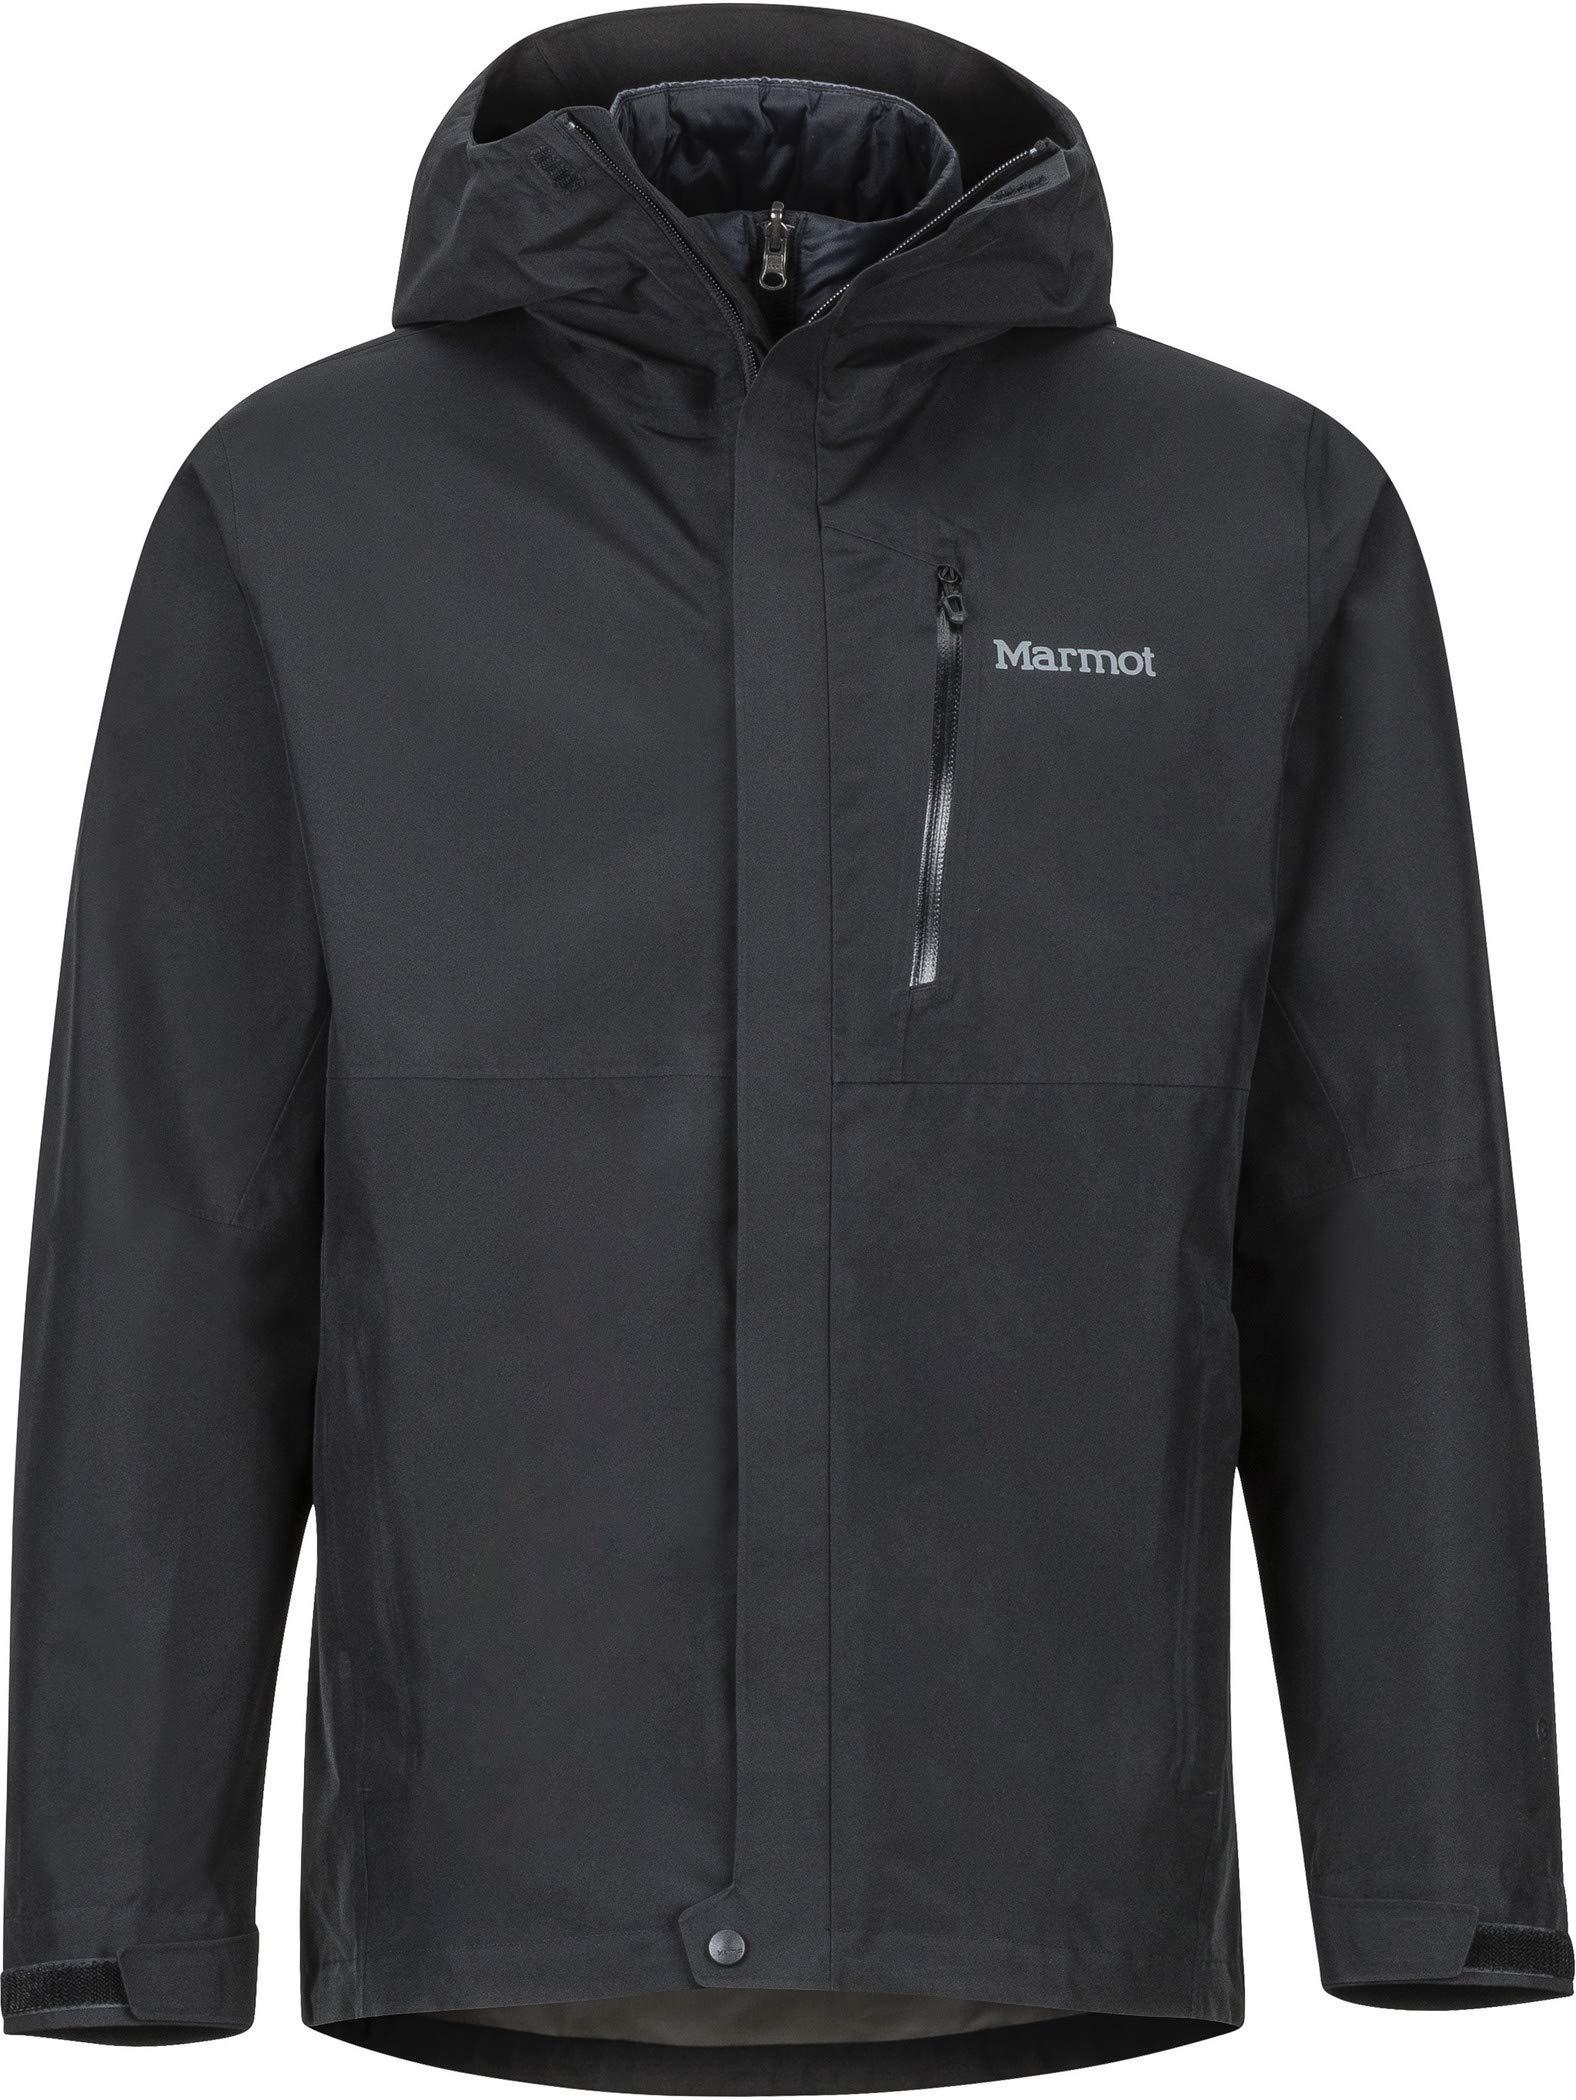 81XzNdxnW9L - Marmot Children's Minimalist Component' Jacket